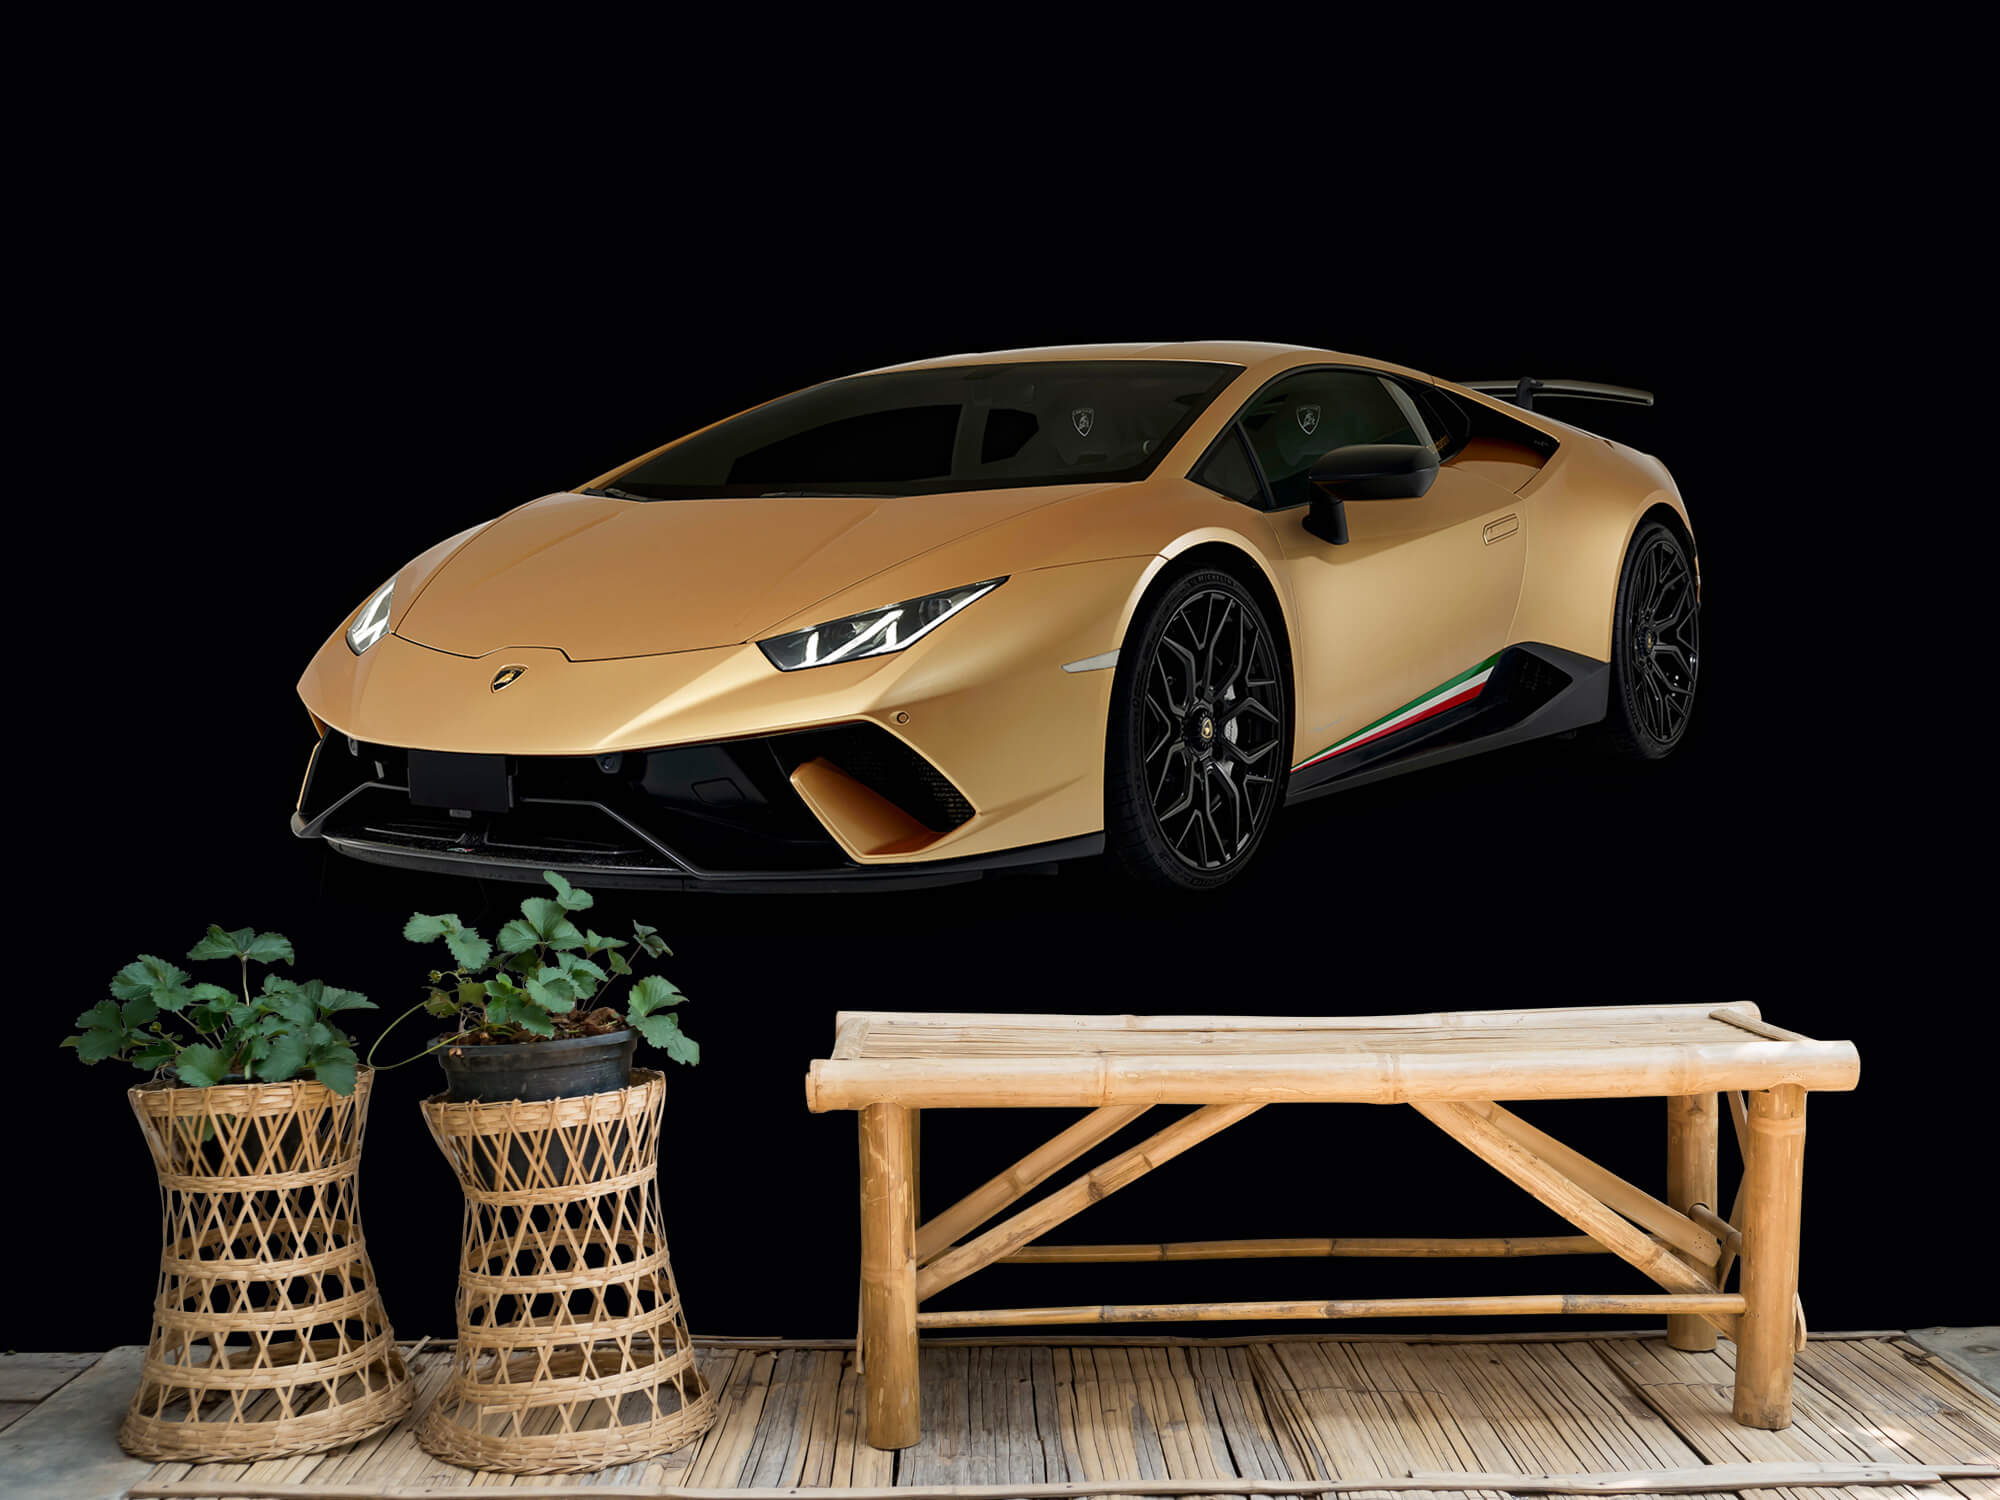 Wallpaper Lamborghini Huracán - Avant droit, noir 6